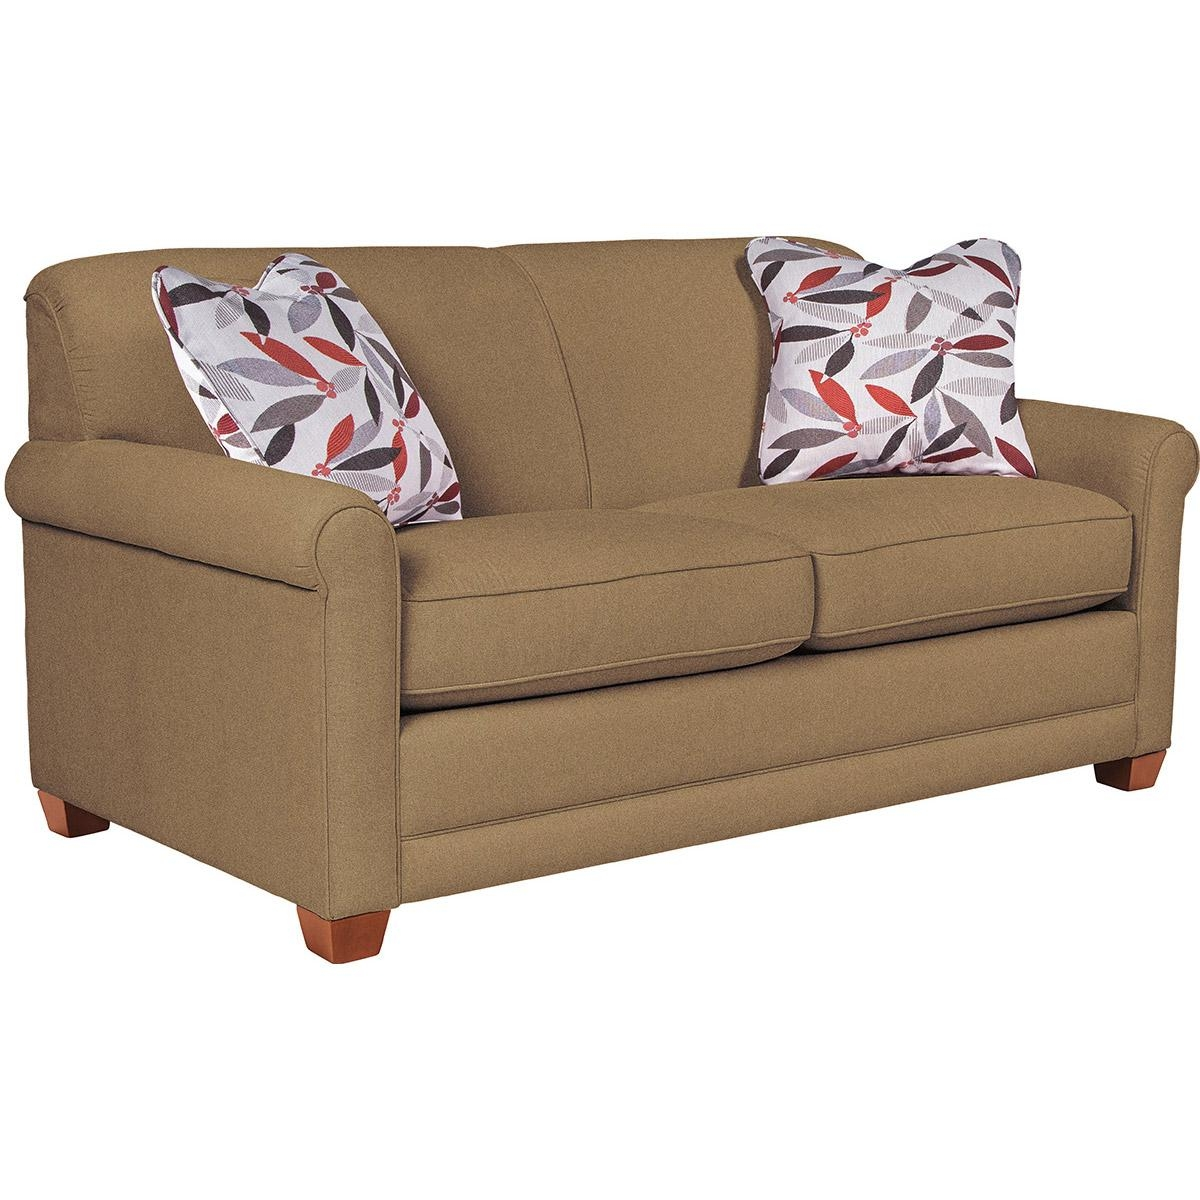 Comfortable & Casual Sofas | La Z Boy Regarding Lazy Boy Sofas (View 5 of 20)